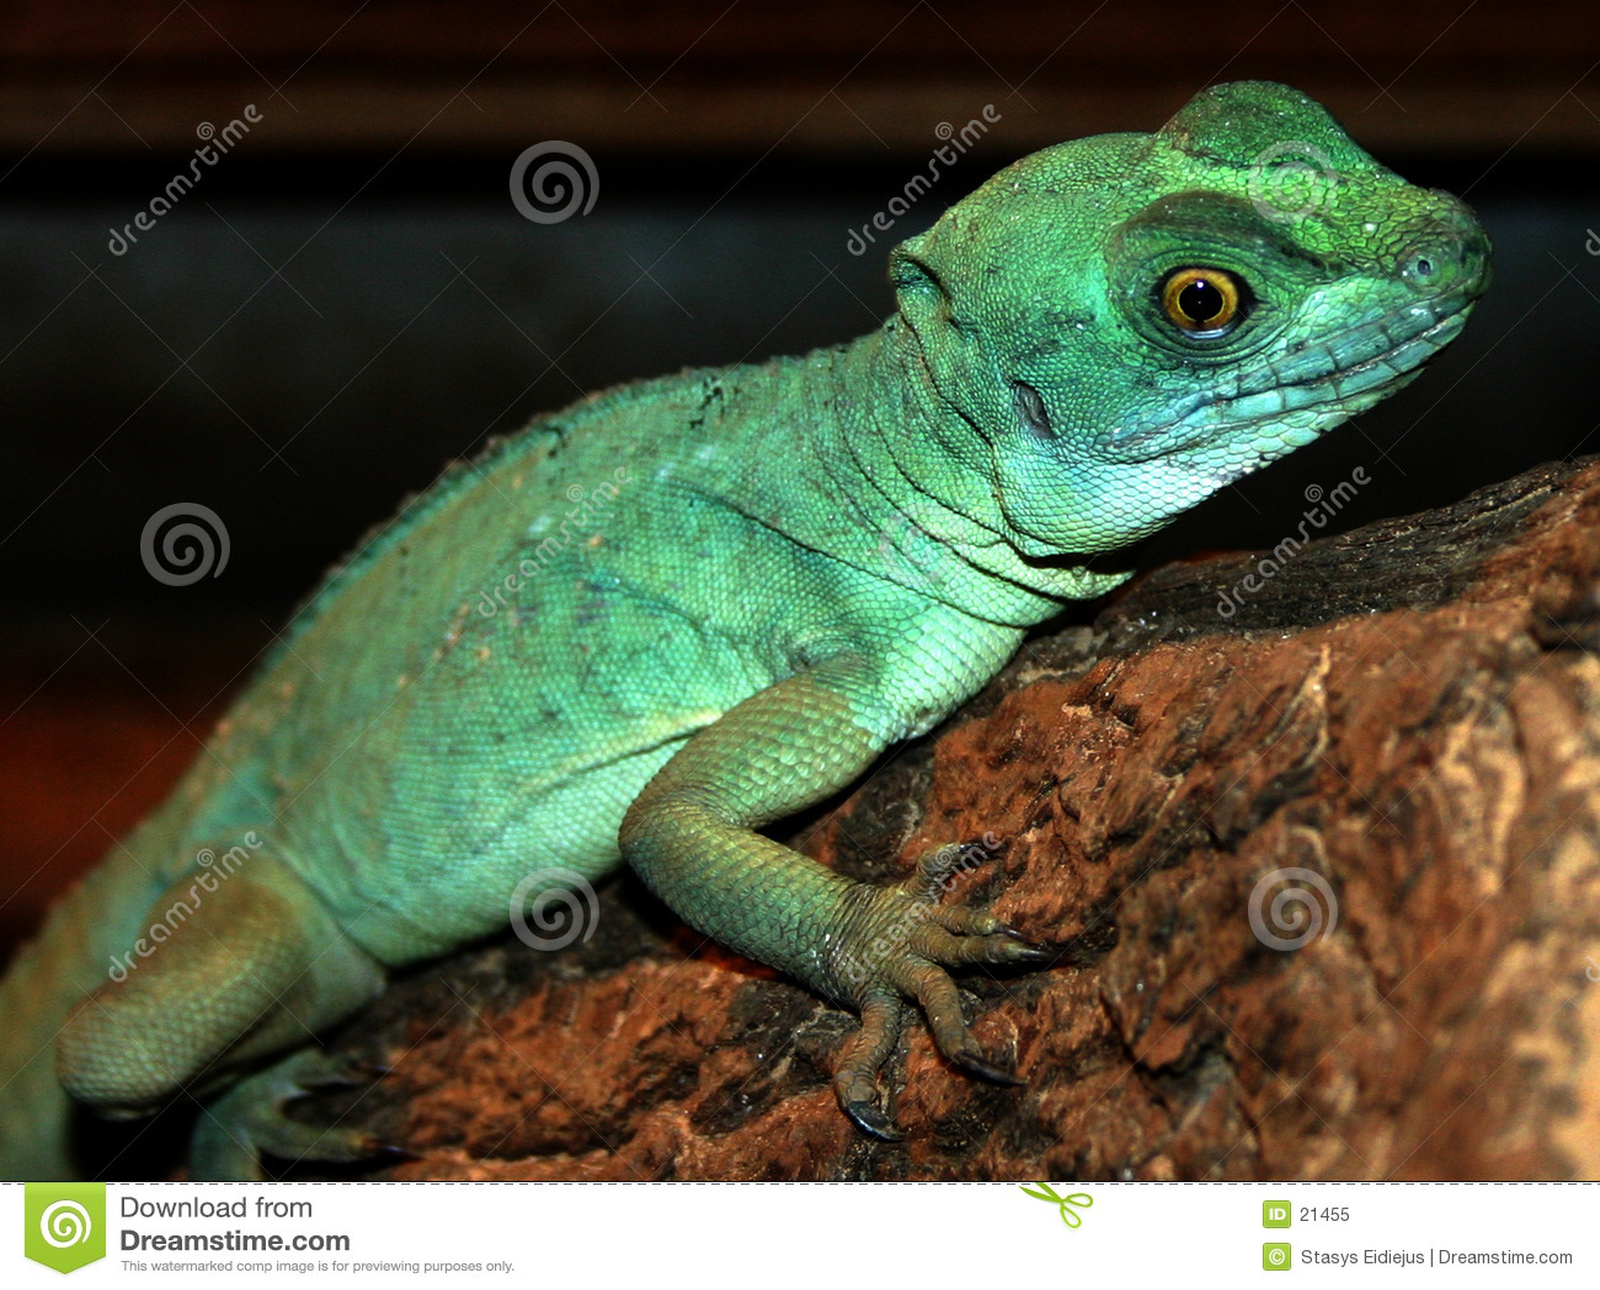 Lizard in the ZOO